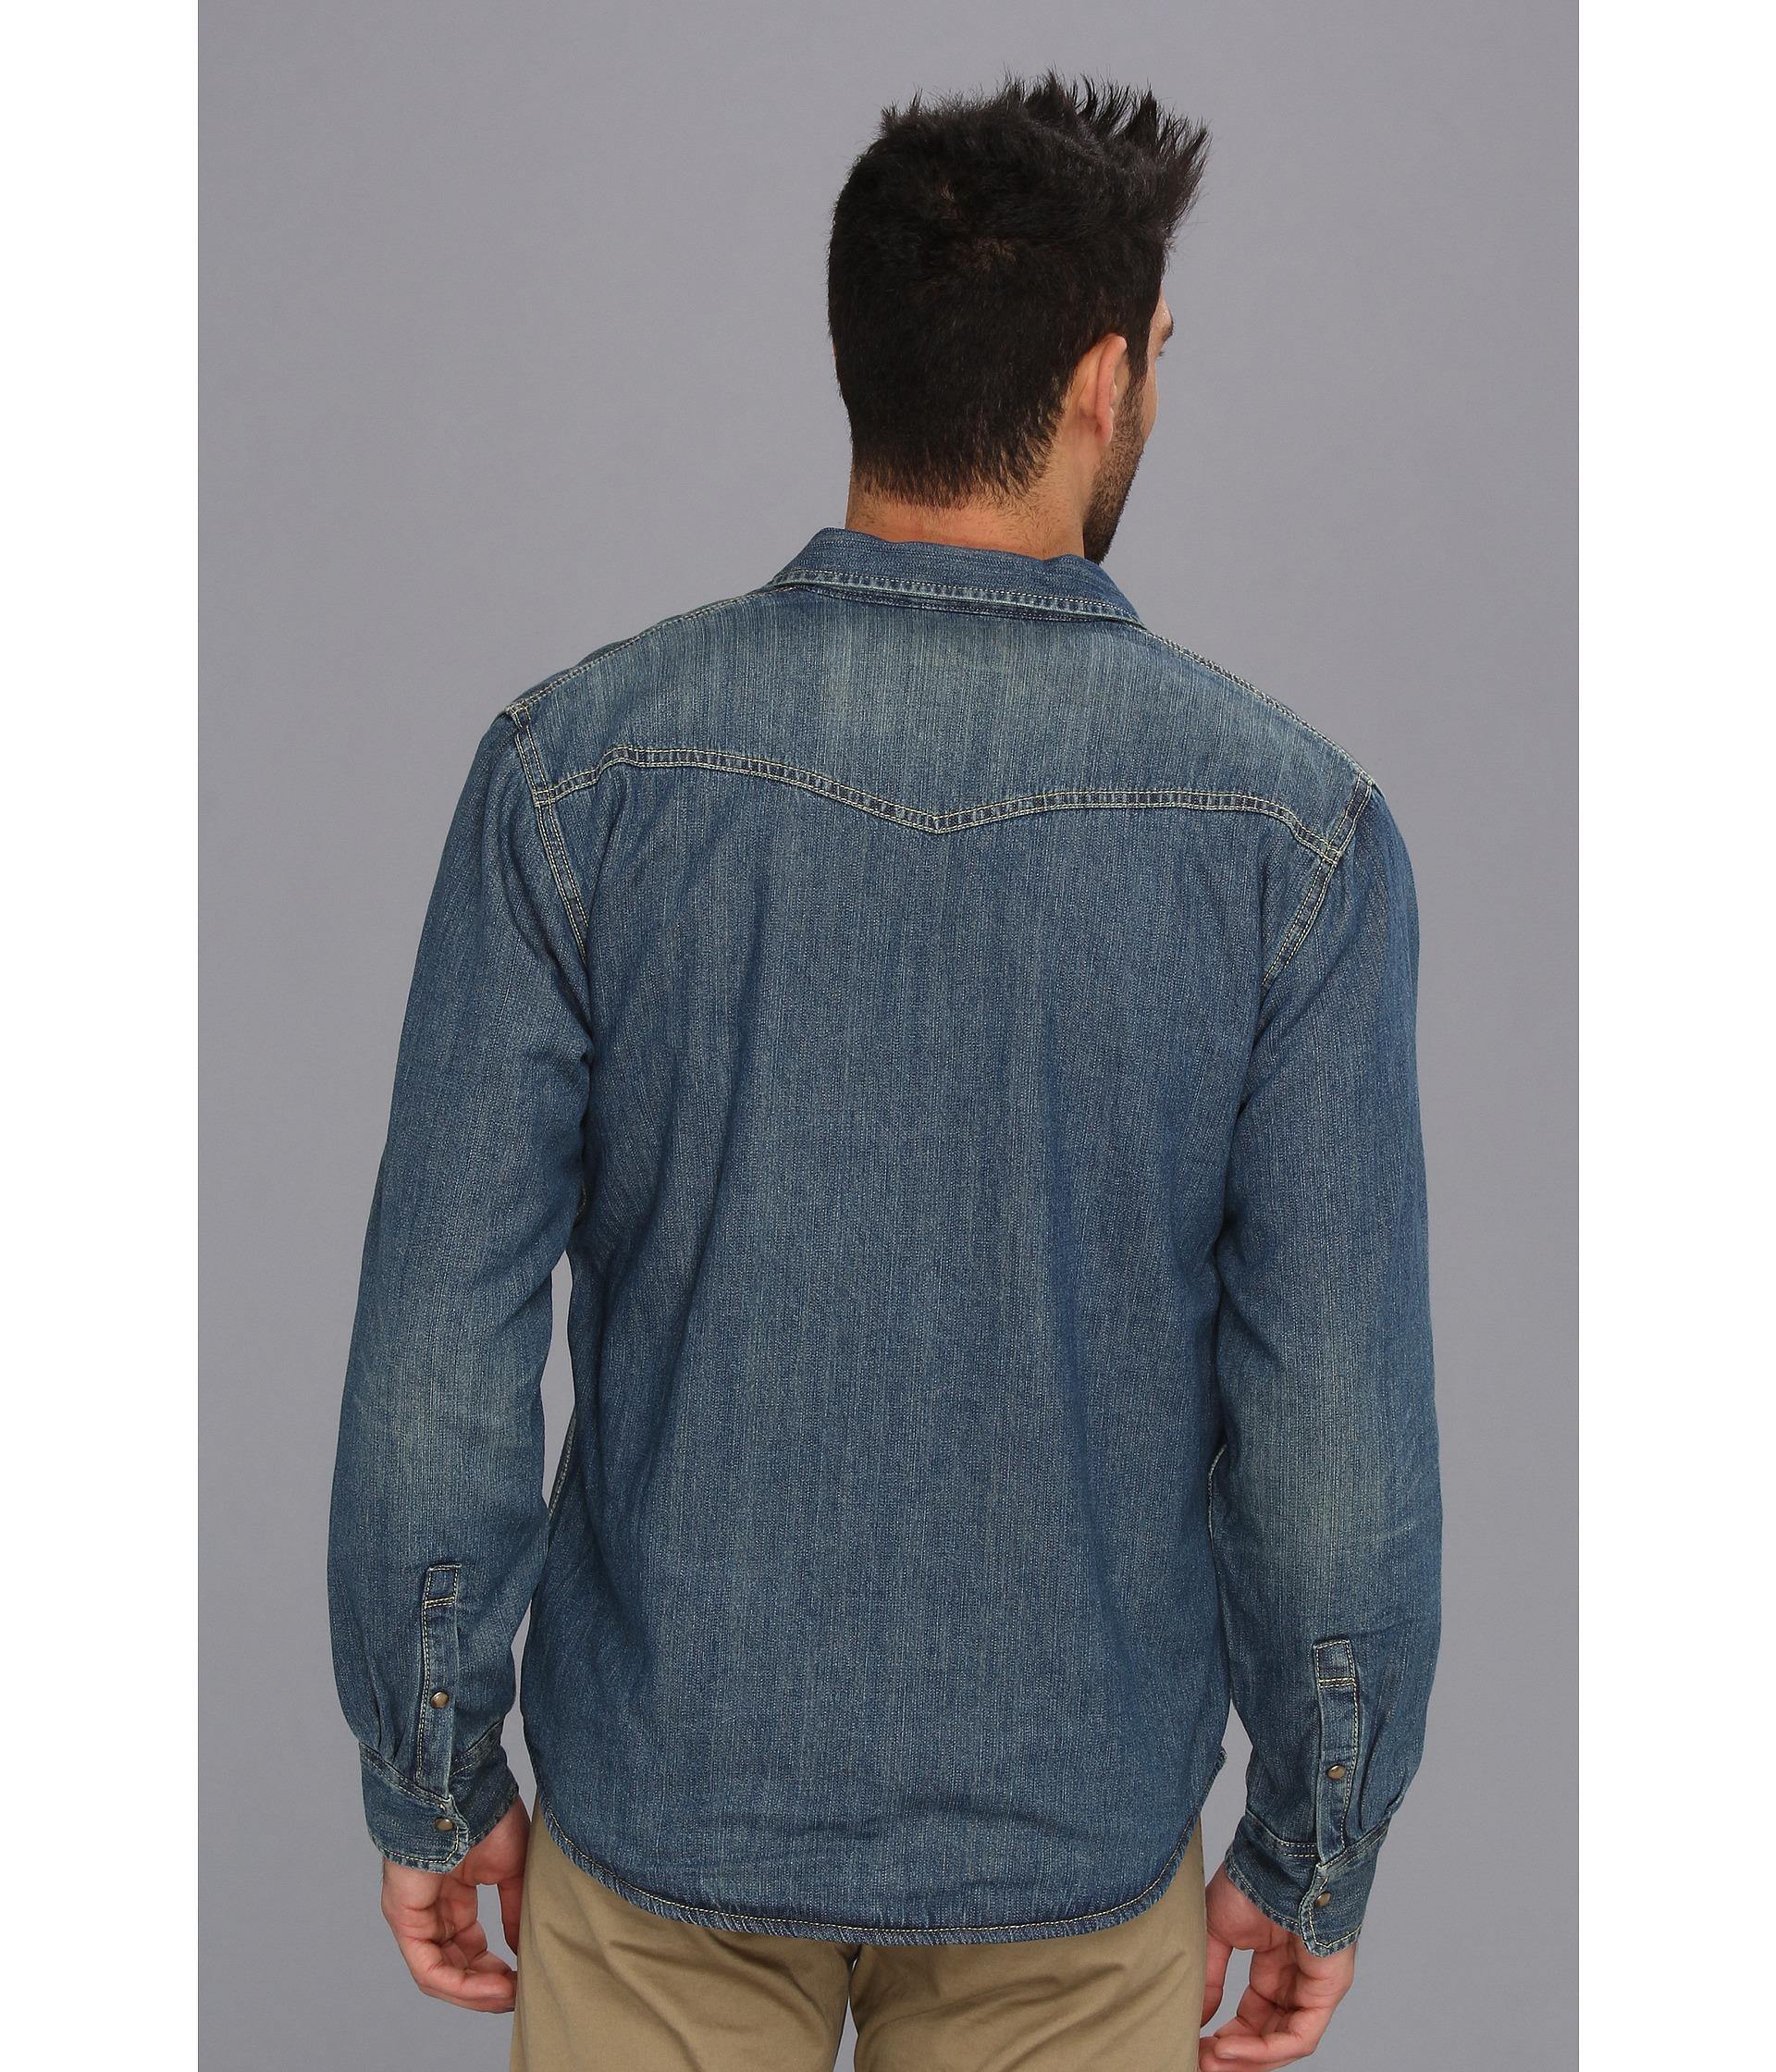 Levis Haywood Sherpa Lined Slub Denim Shirt Jacket